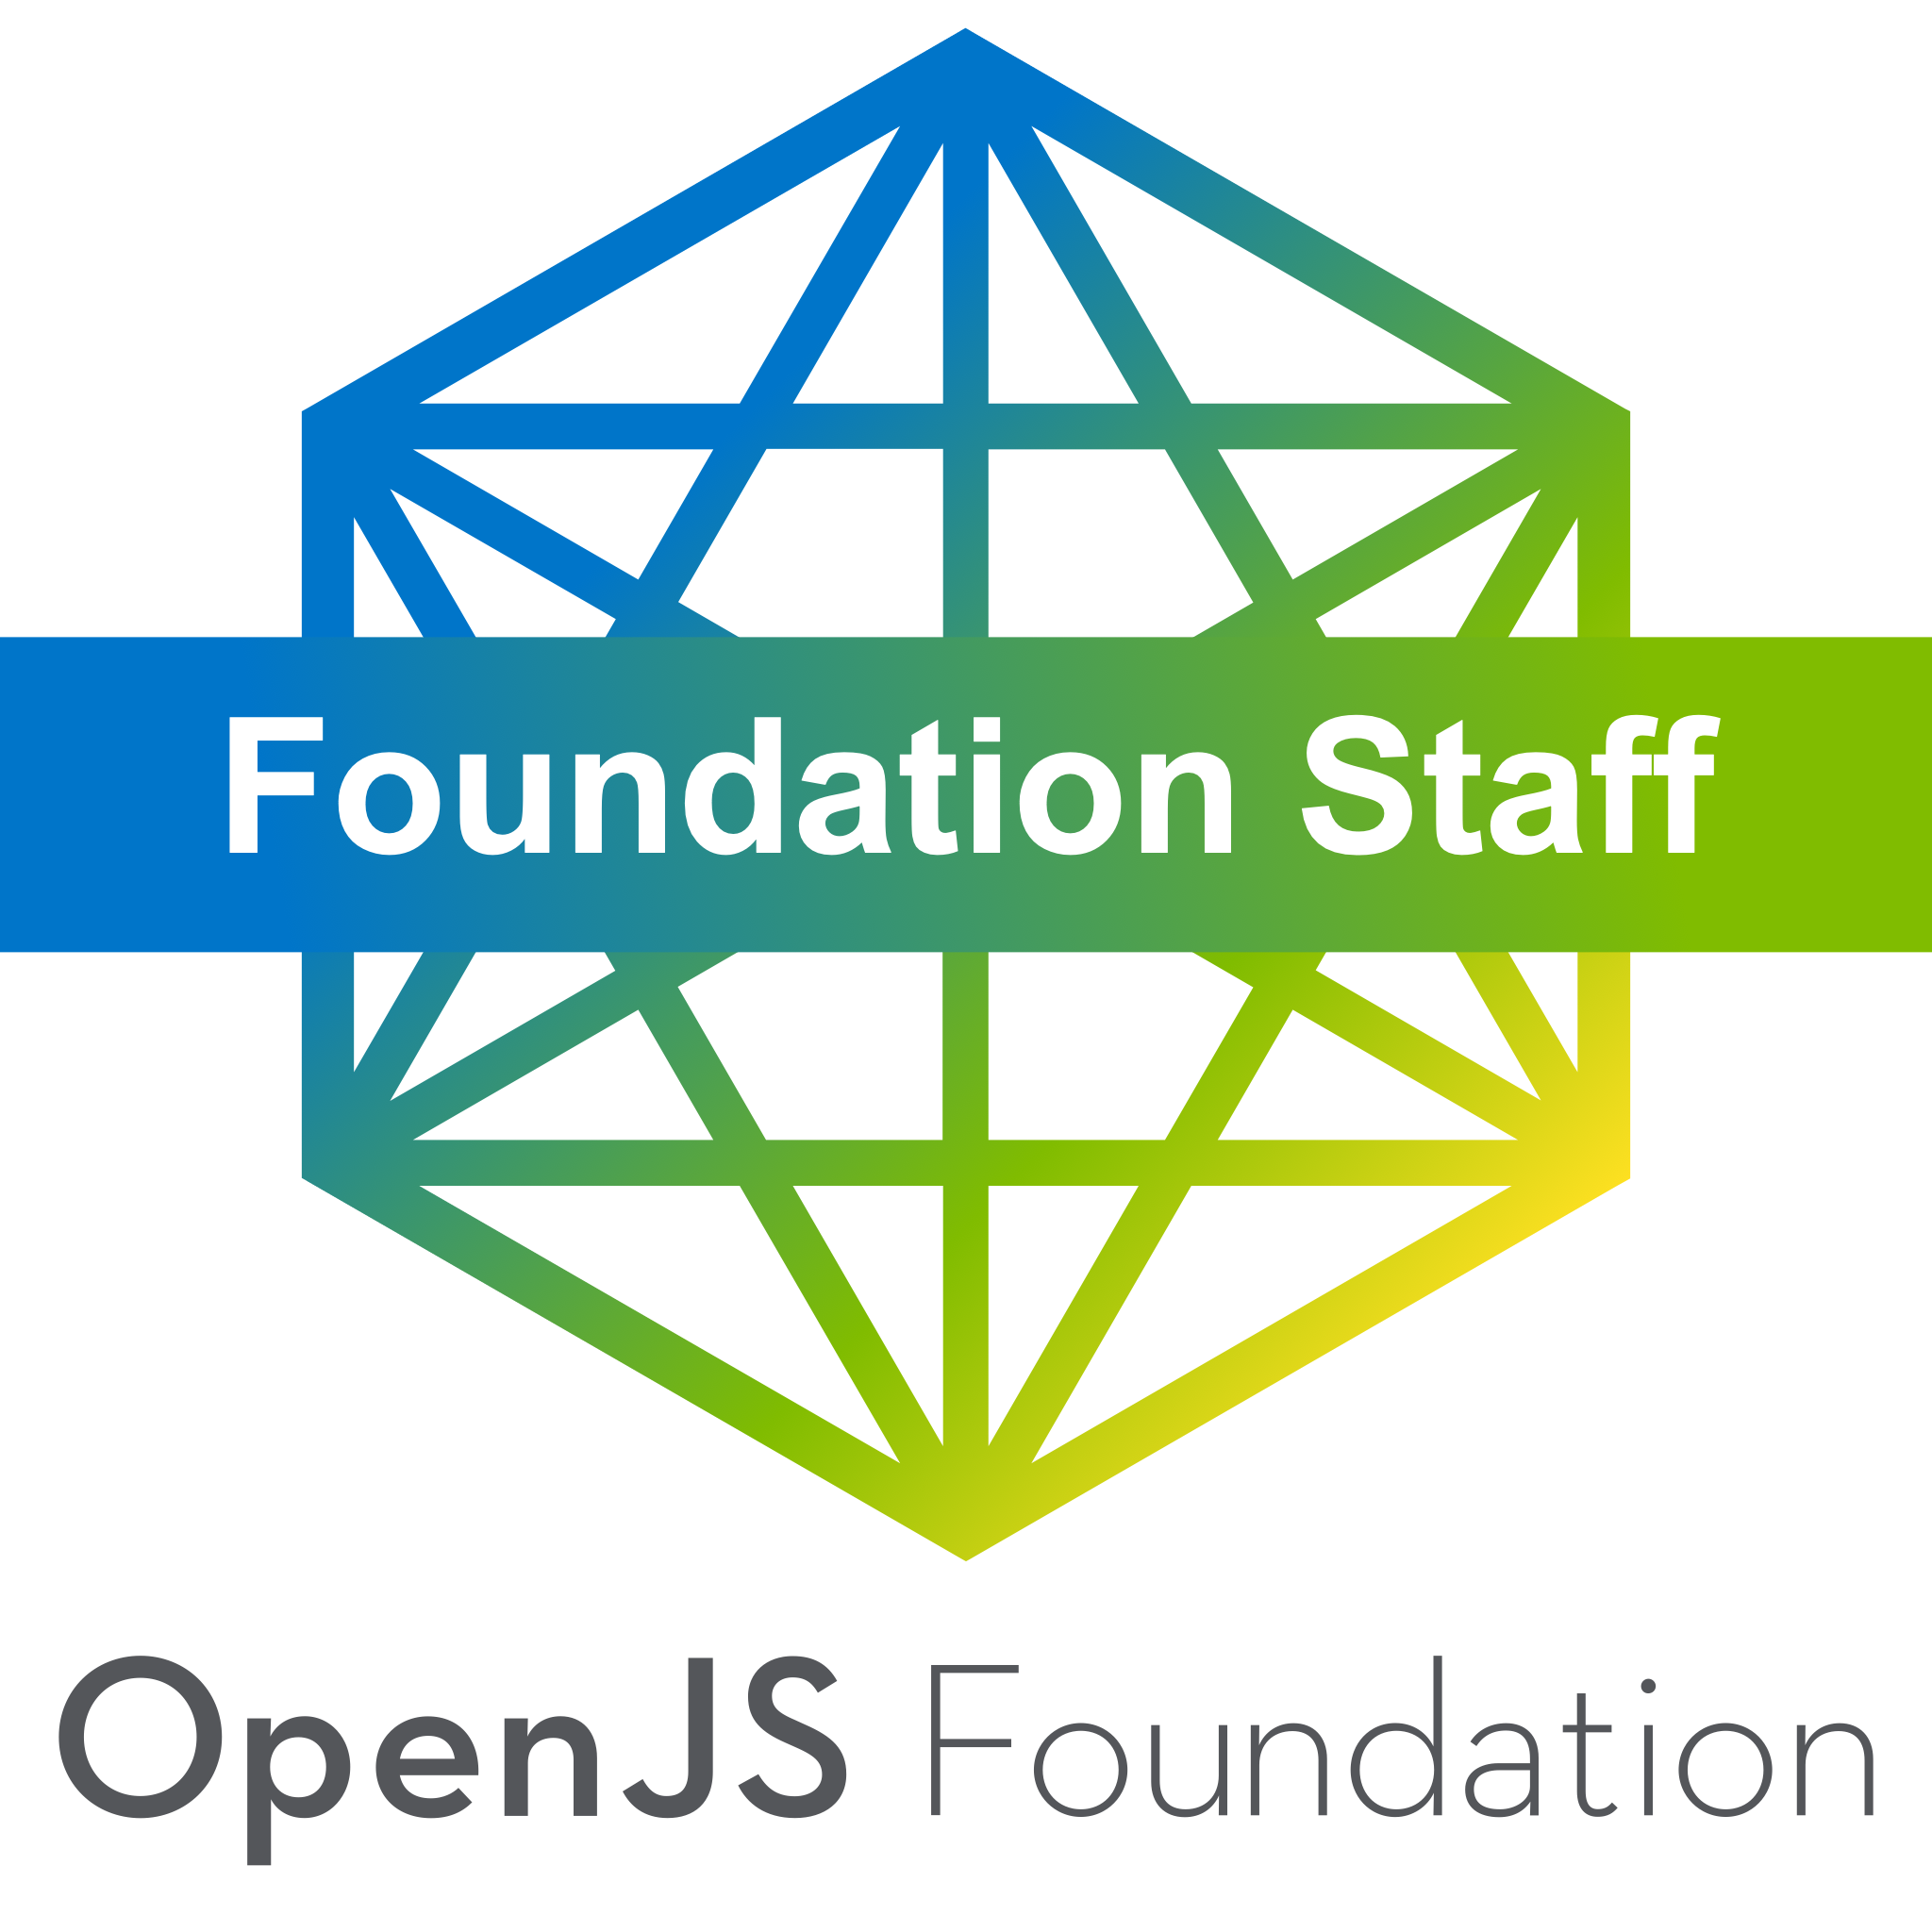 OpenJS Foundation: Foundation staff